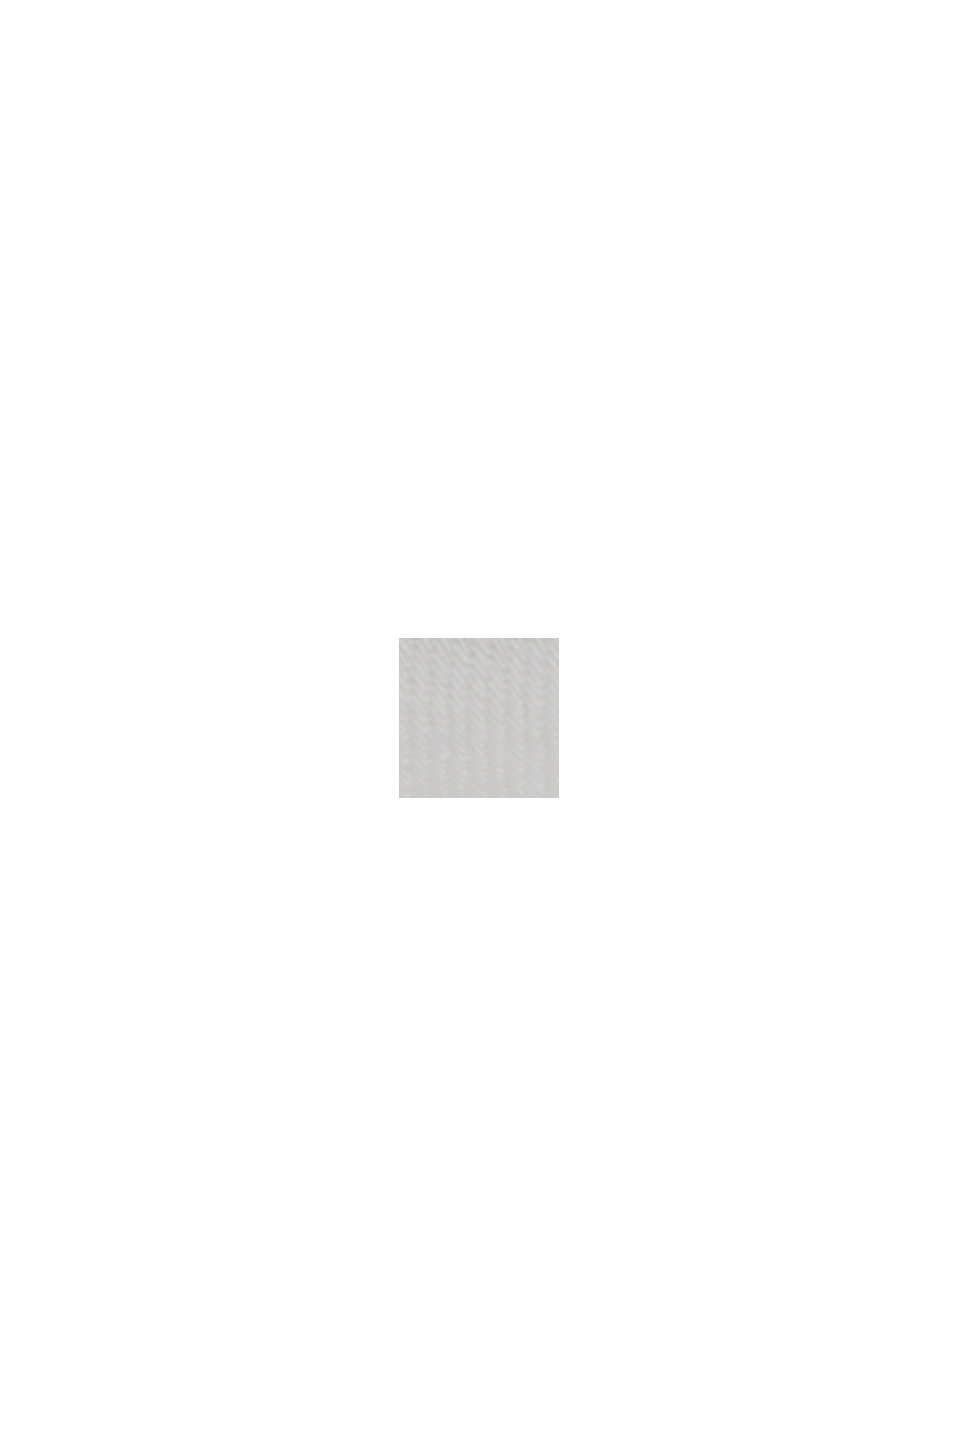 Vaqueros cortos de algodón ecológico, OFF WHITE, swatch